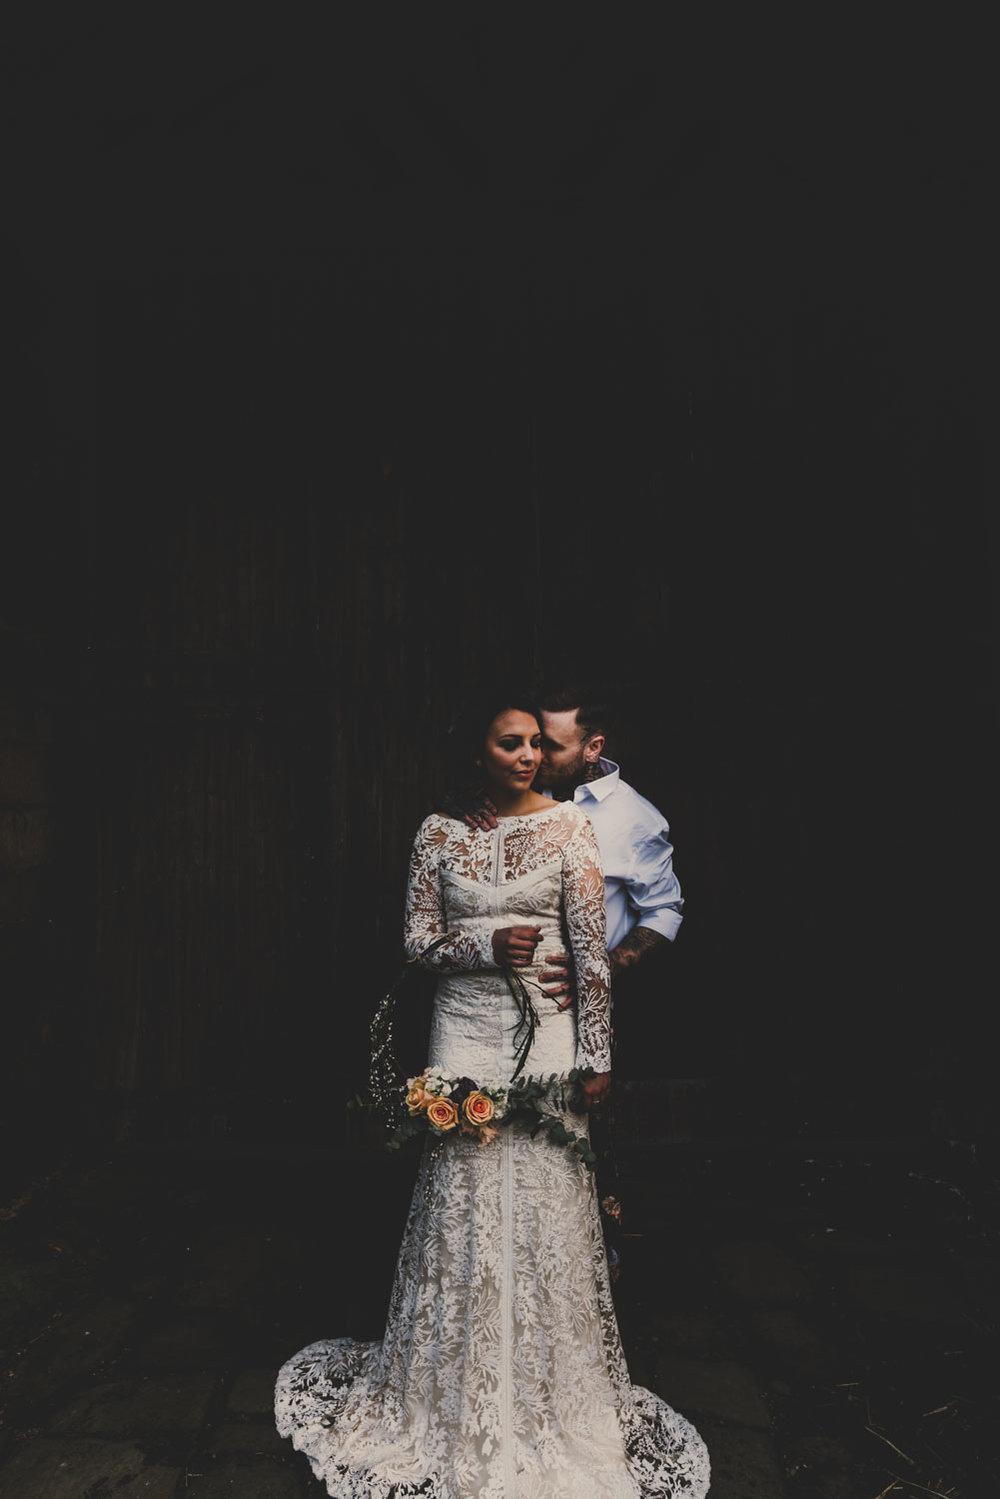 east-riddlesden-hall-wedding-jade-maguire-photography (37).jpg